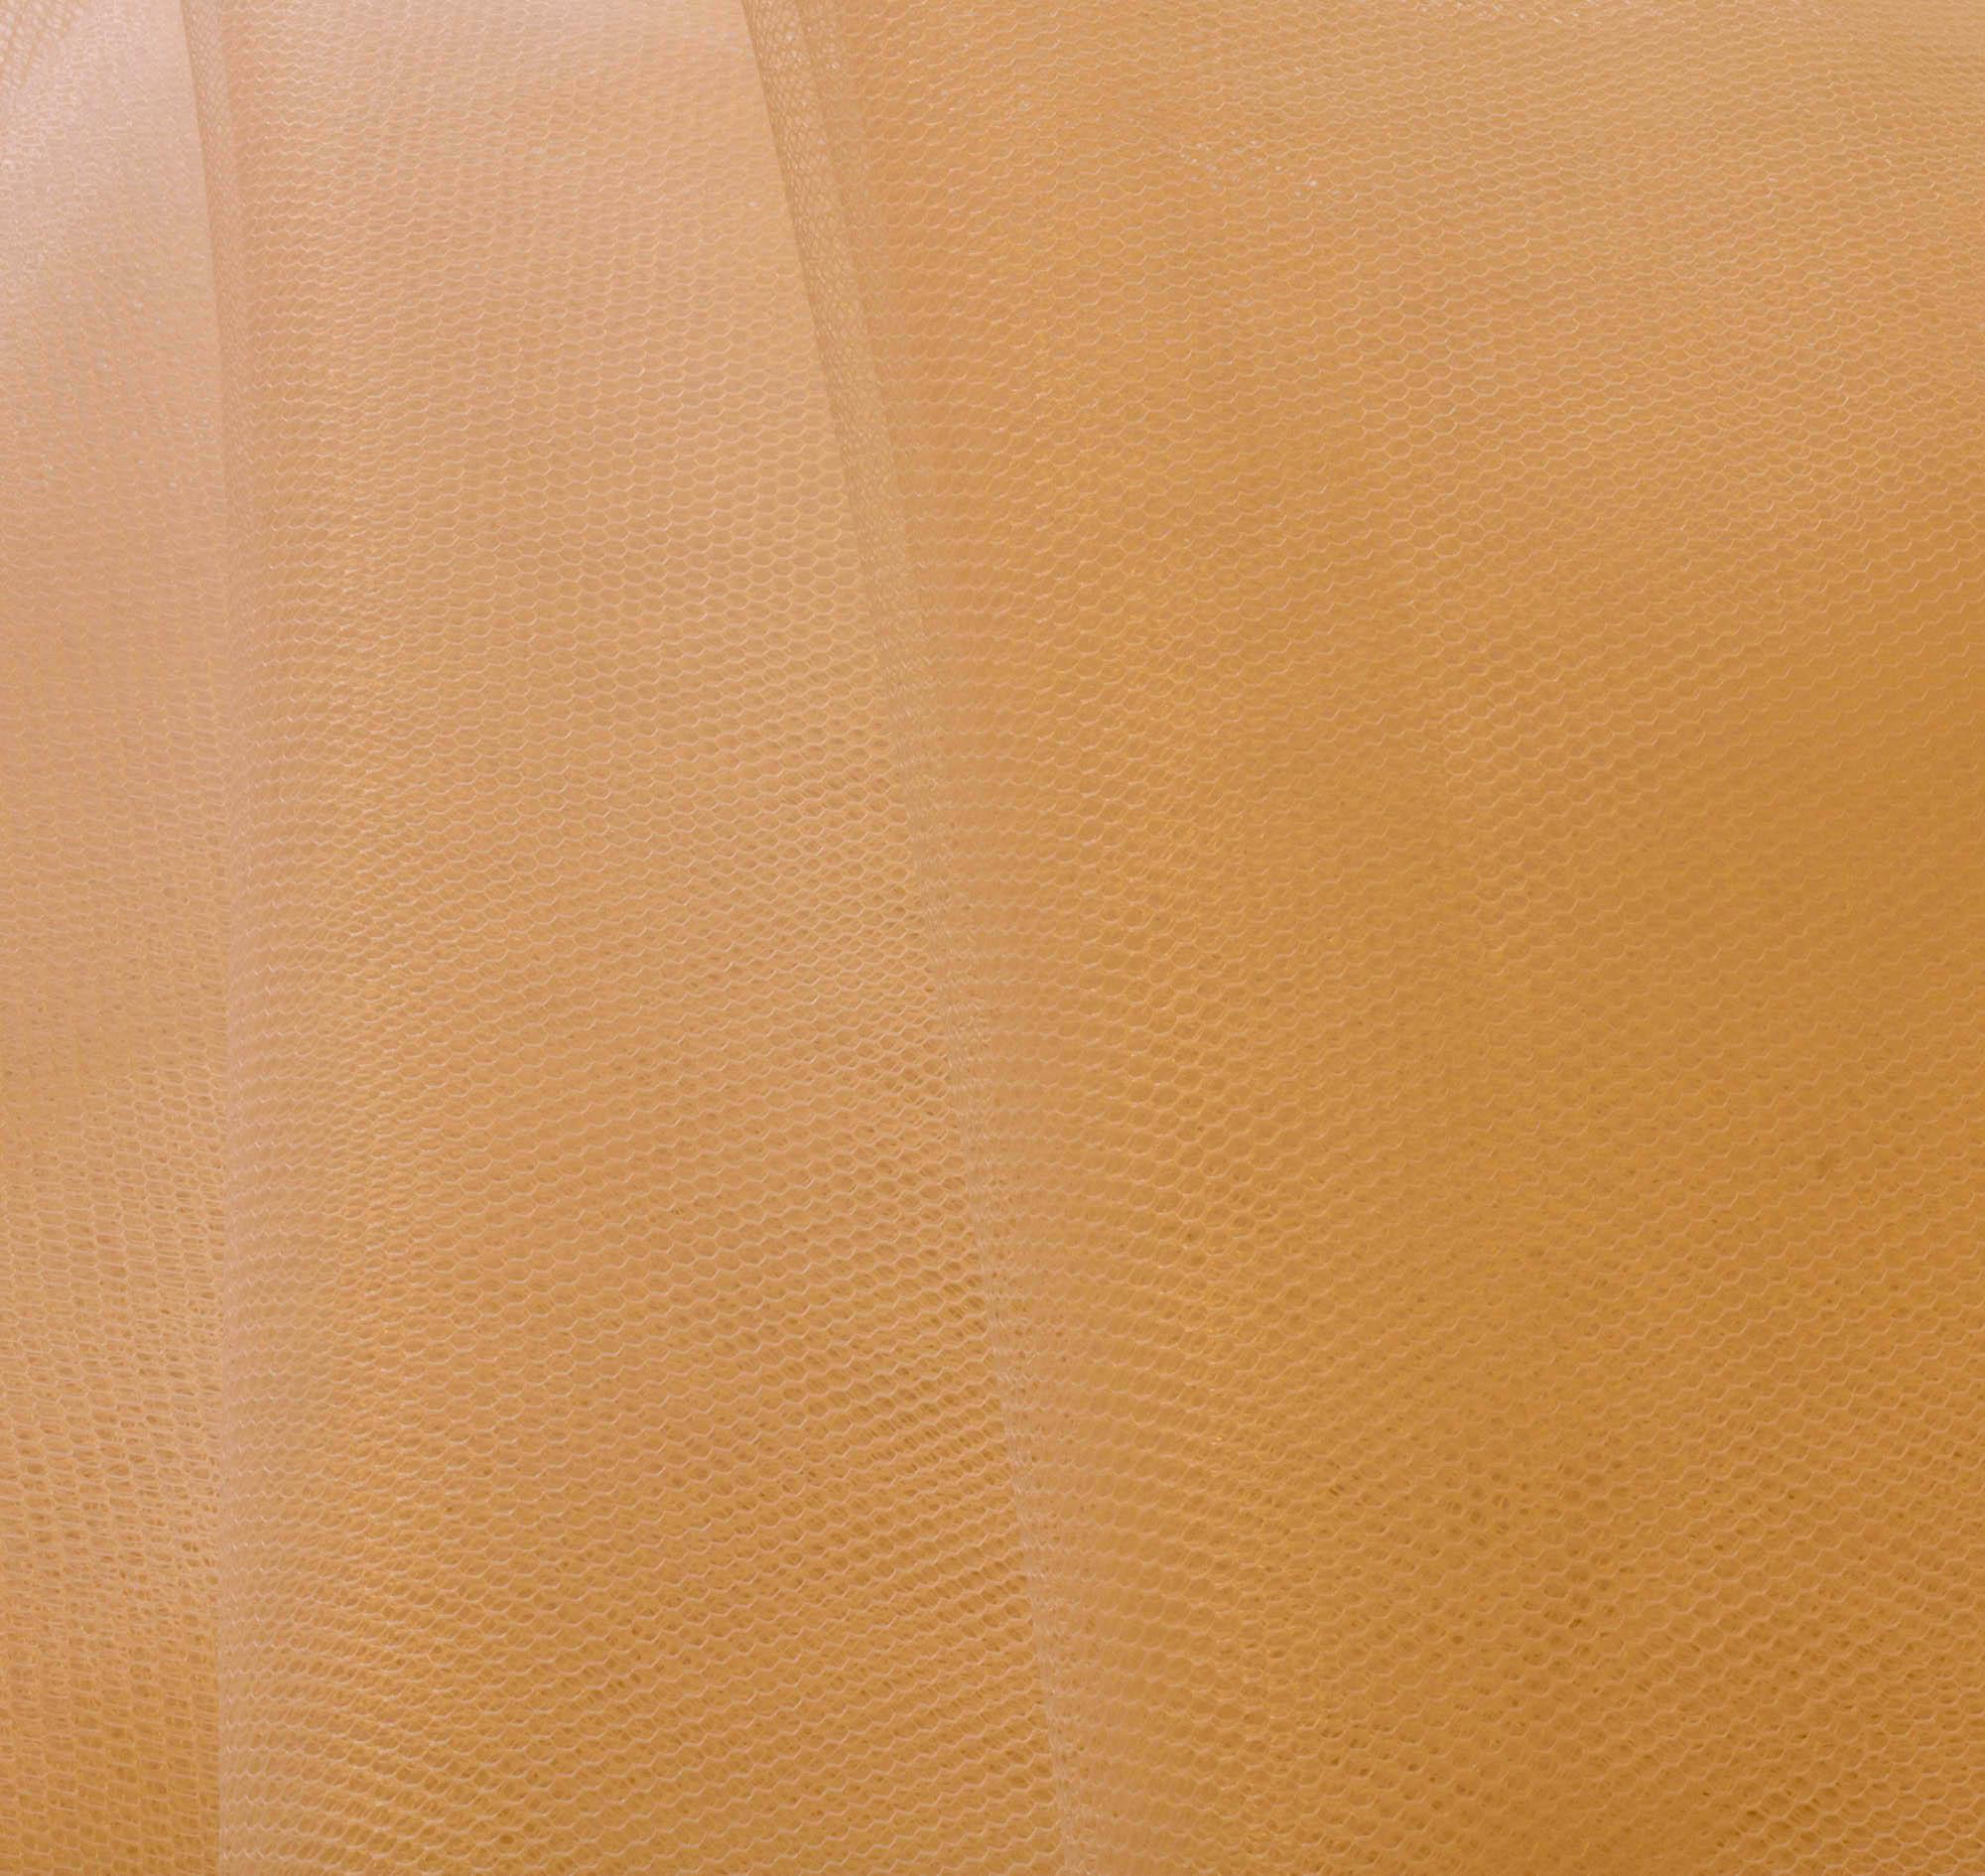 Tecido Filó Bege 100% Poliamida 3 m Largura